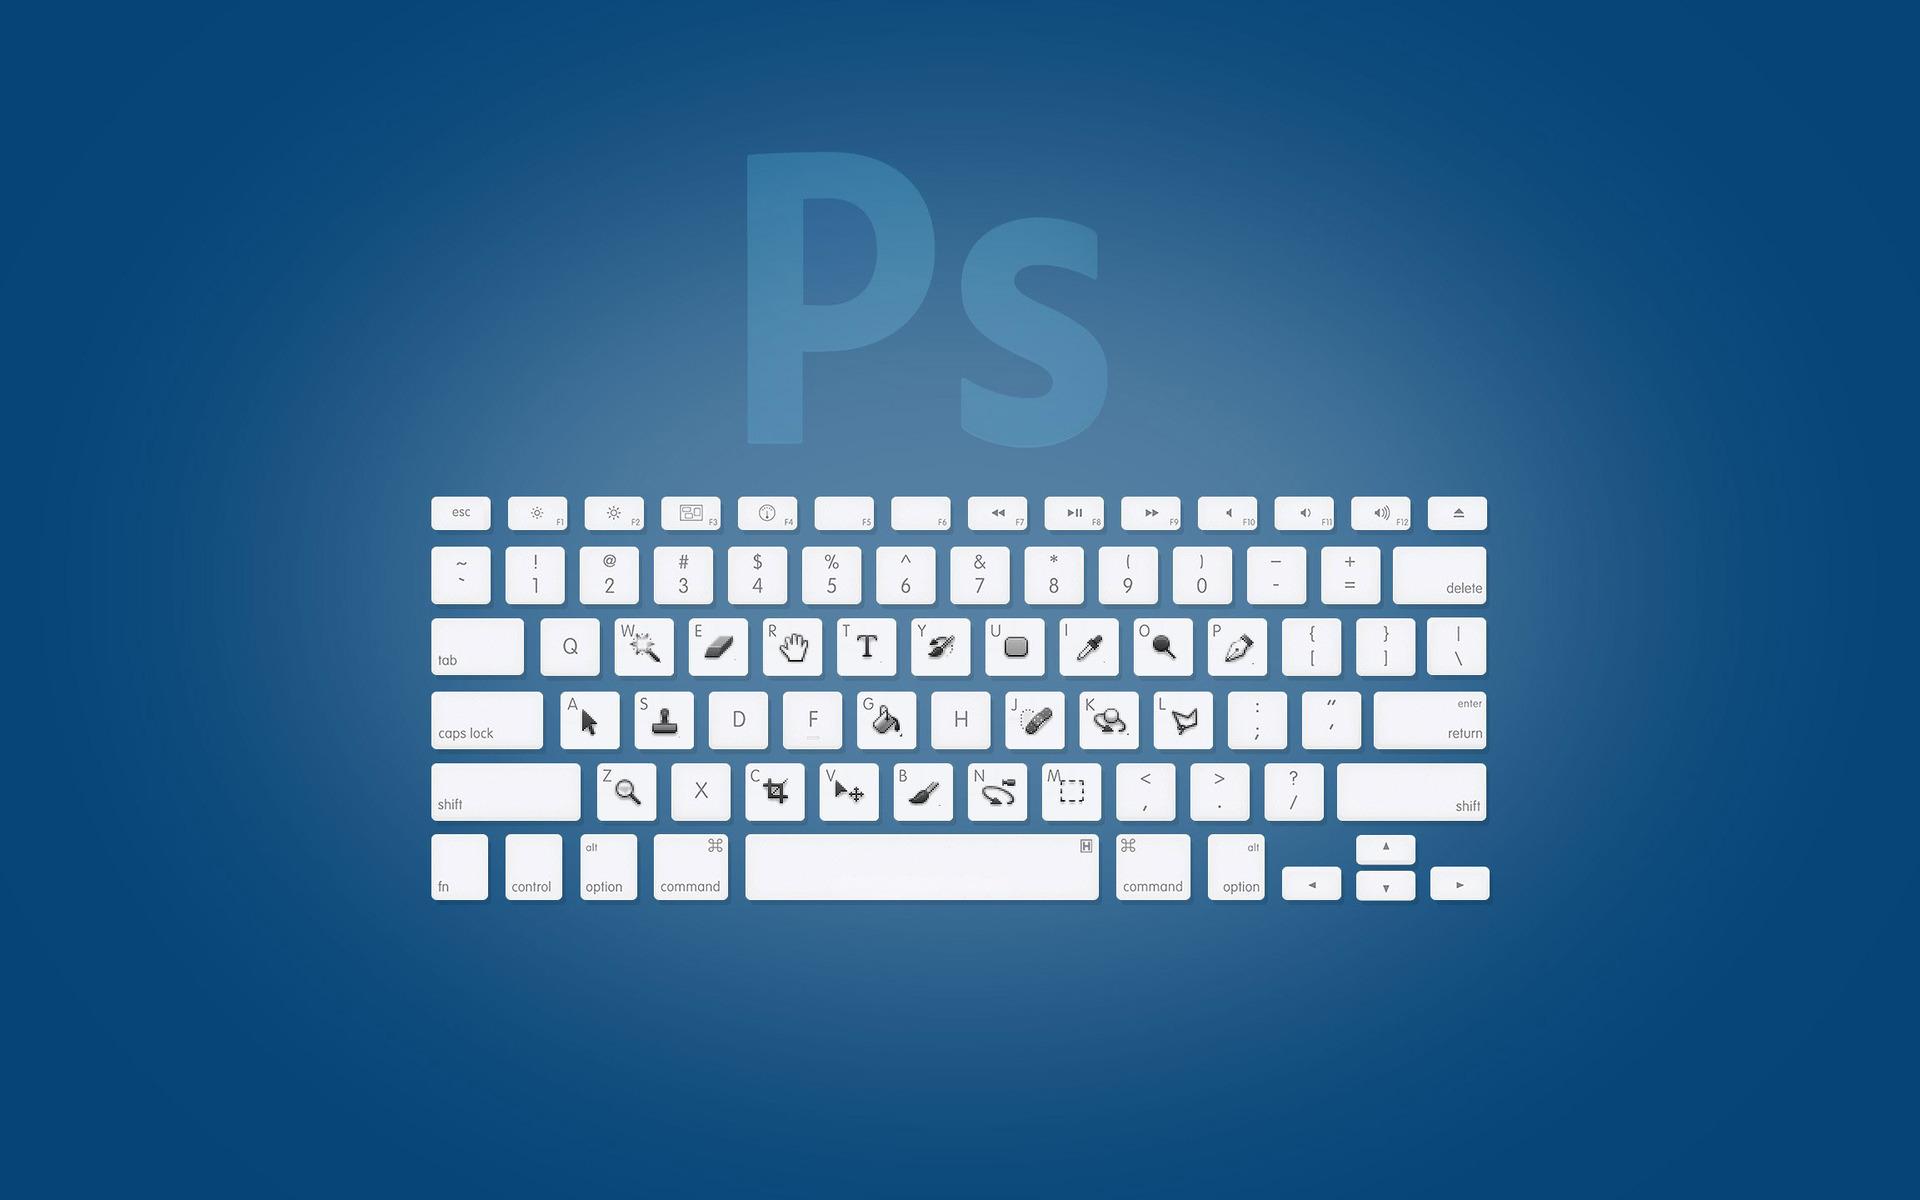 Adobe Photoshop Keyboard Shortcuts Computer Hd Wallpaper 1920x1200 2192 Santiago Barrionuevo